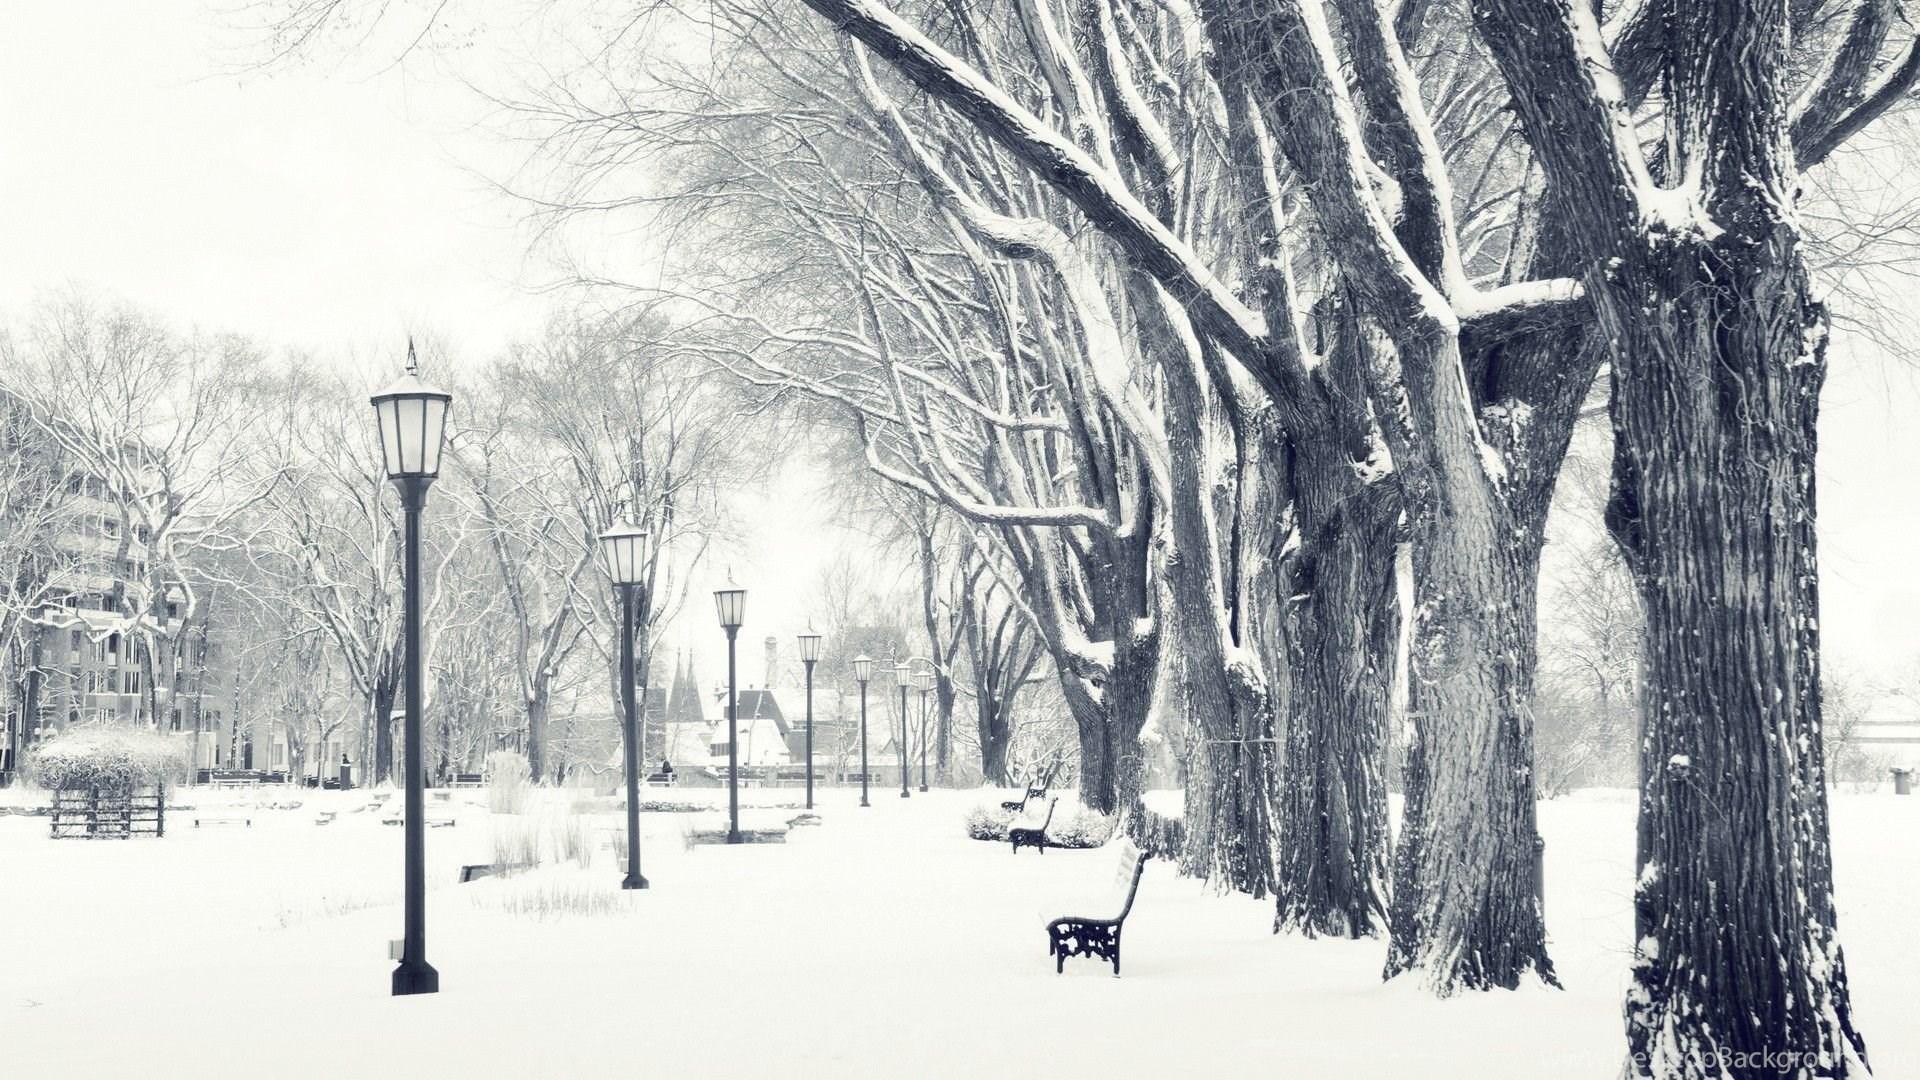 8543 snow falling hd